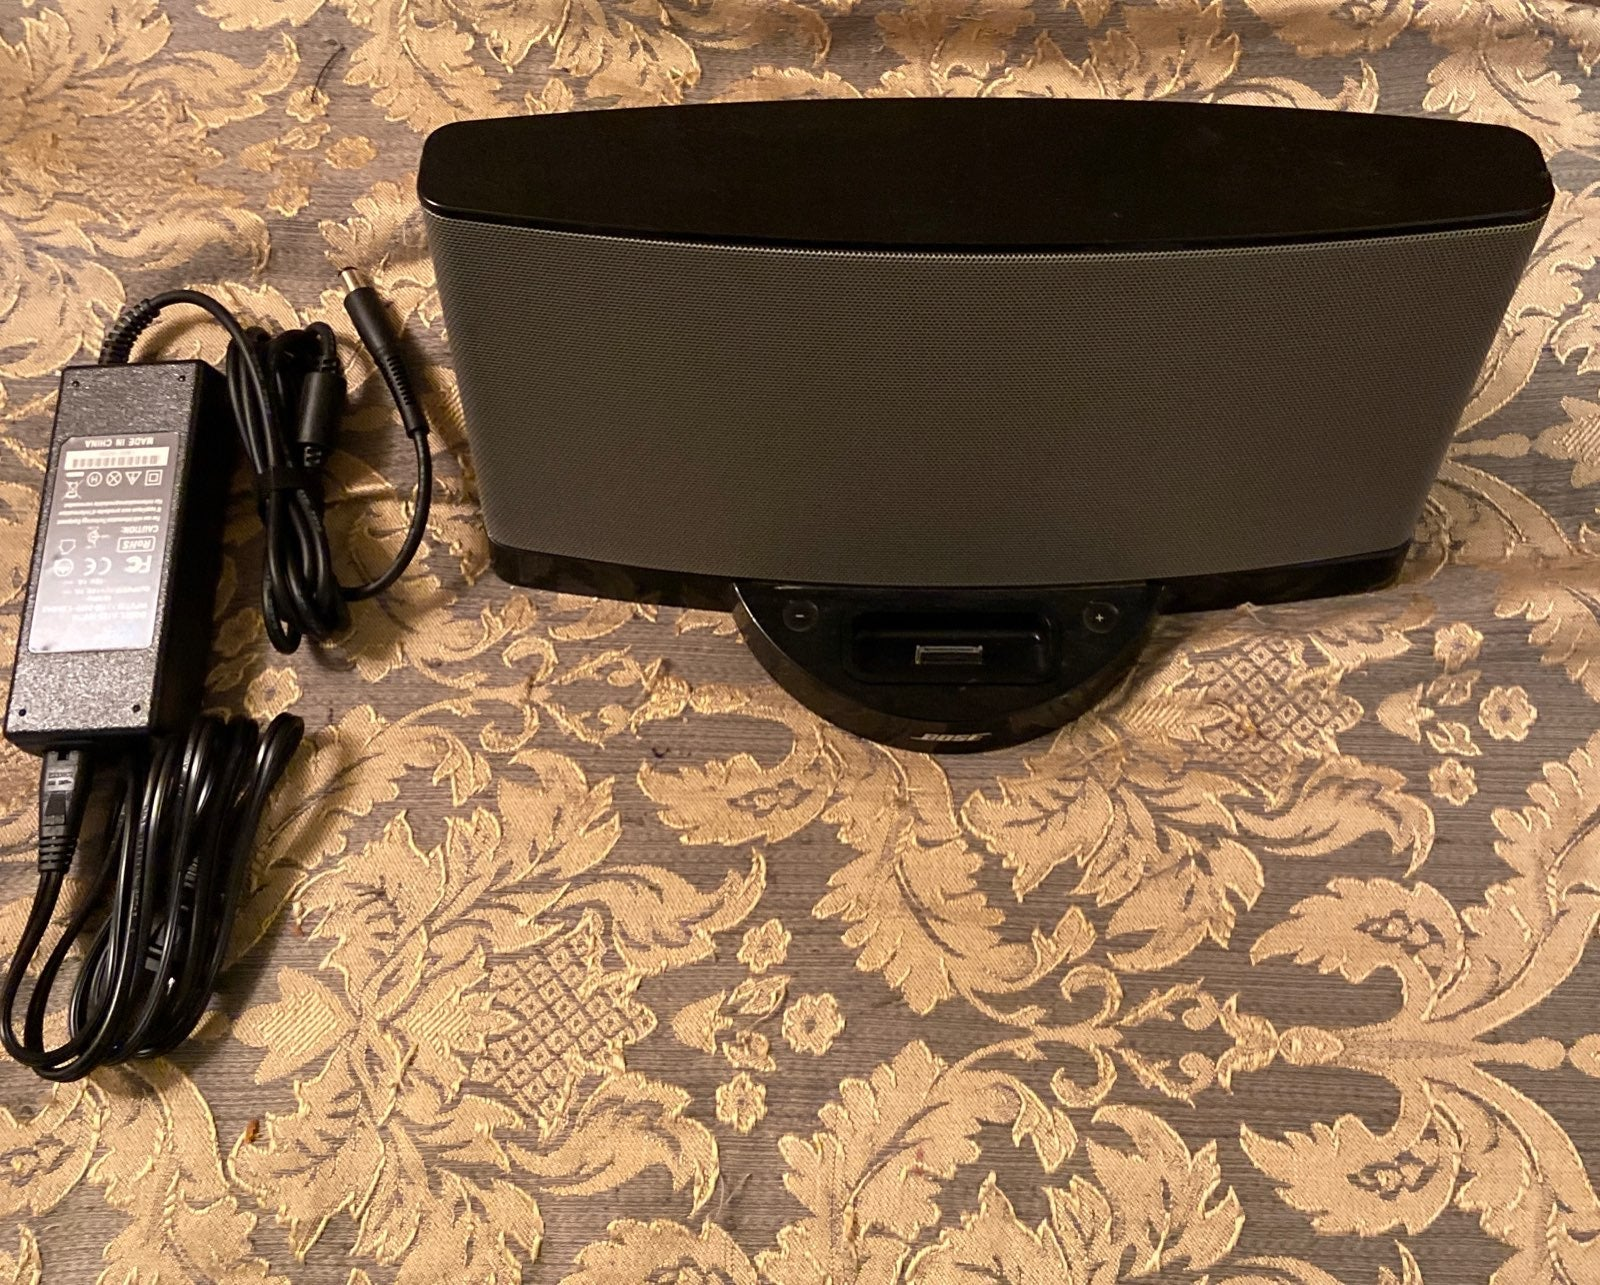 Bose SoundDock series II digital music